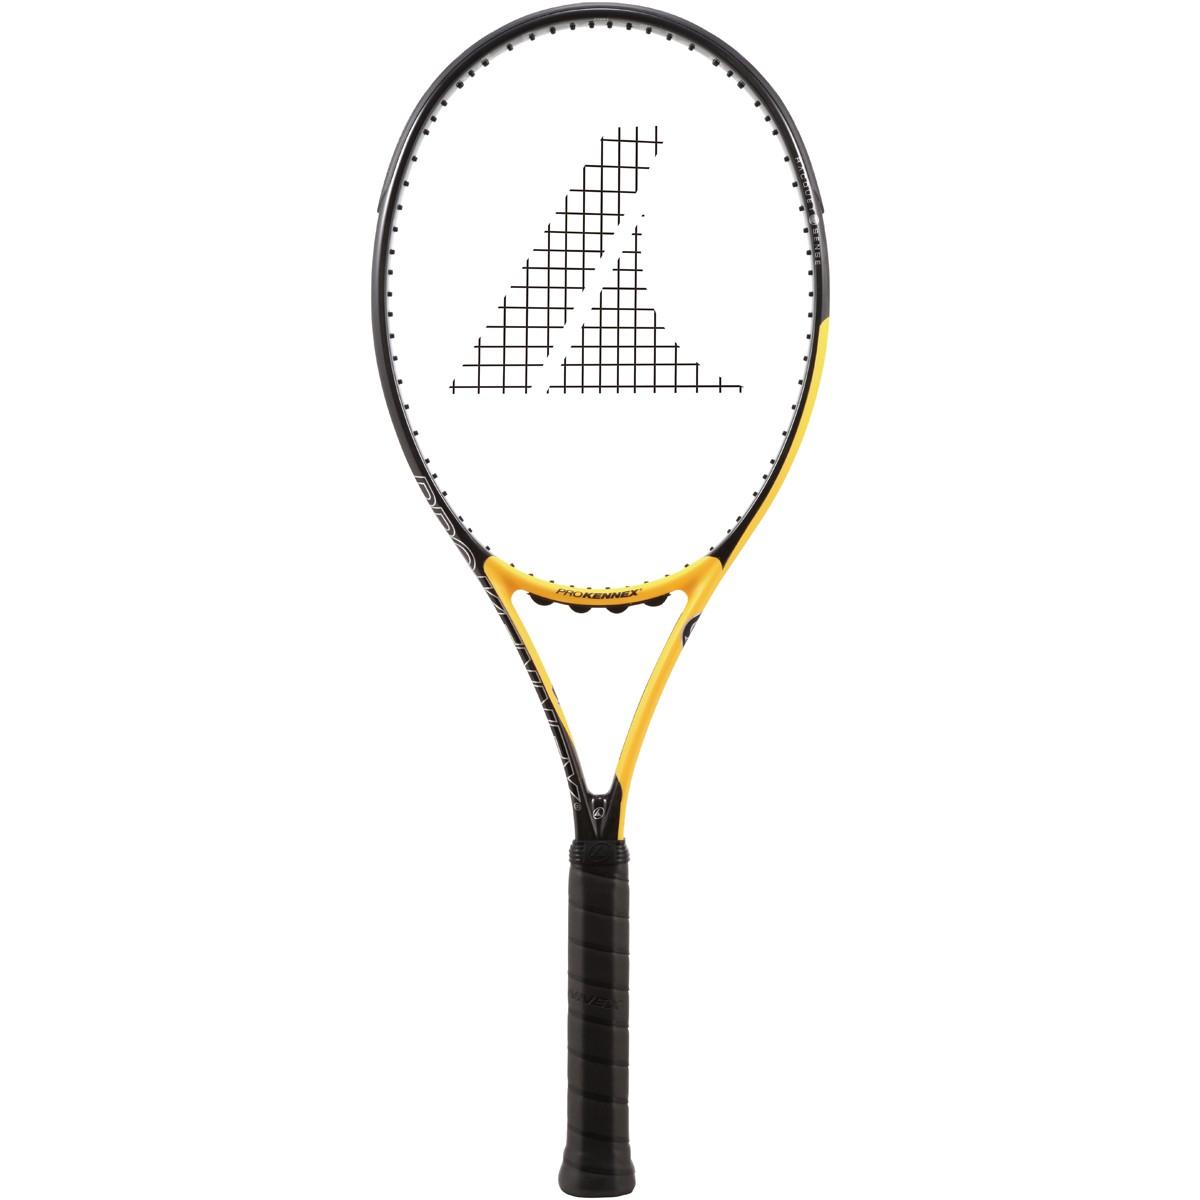 Prokennex Ace 21 Junior Raquette De Tennis